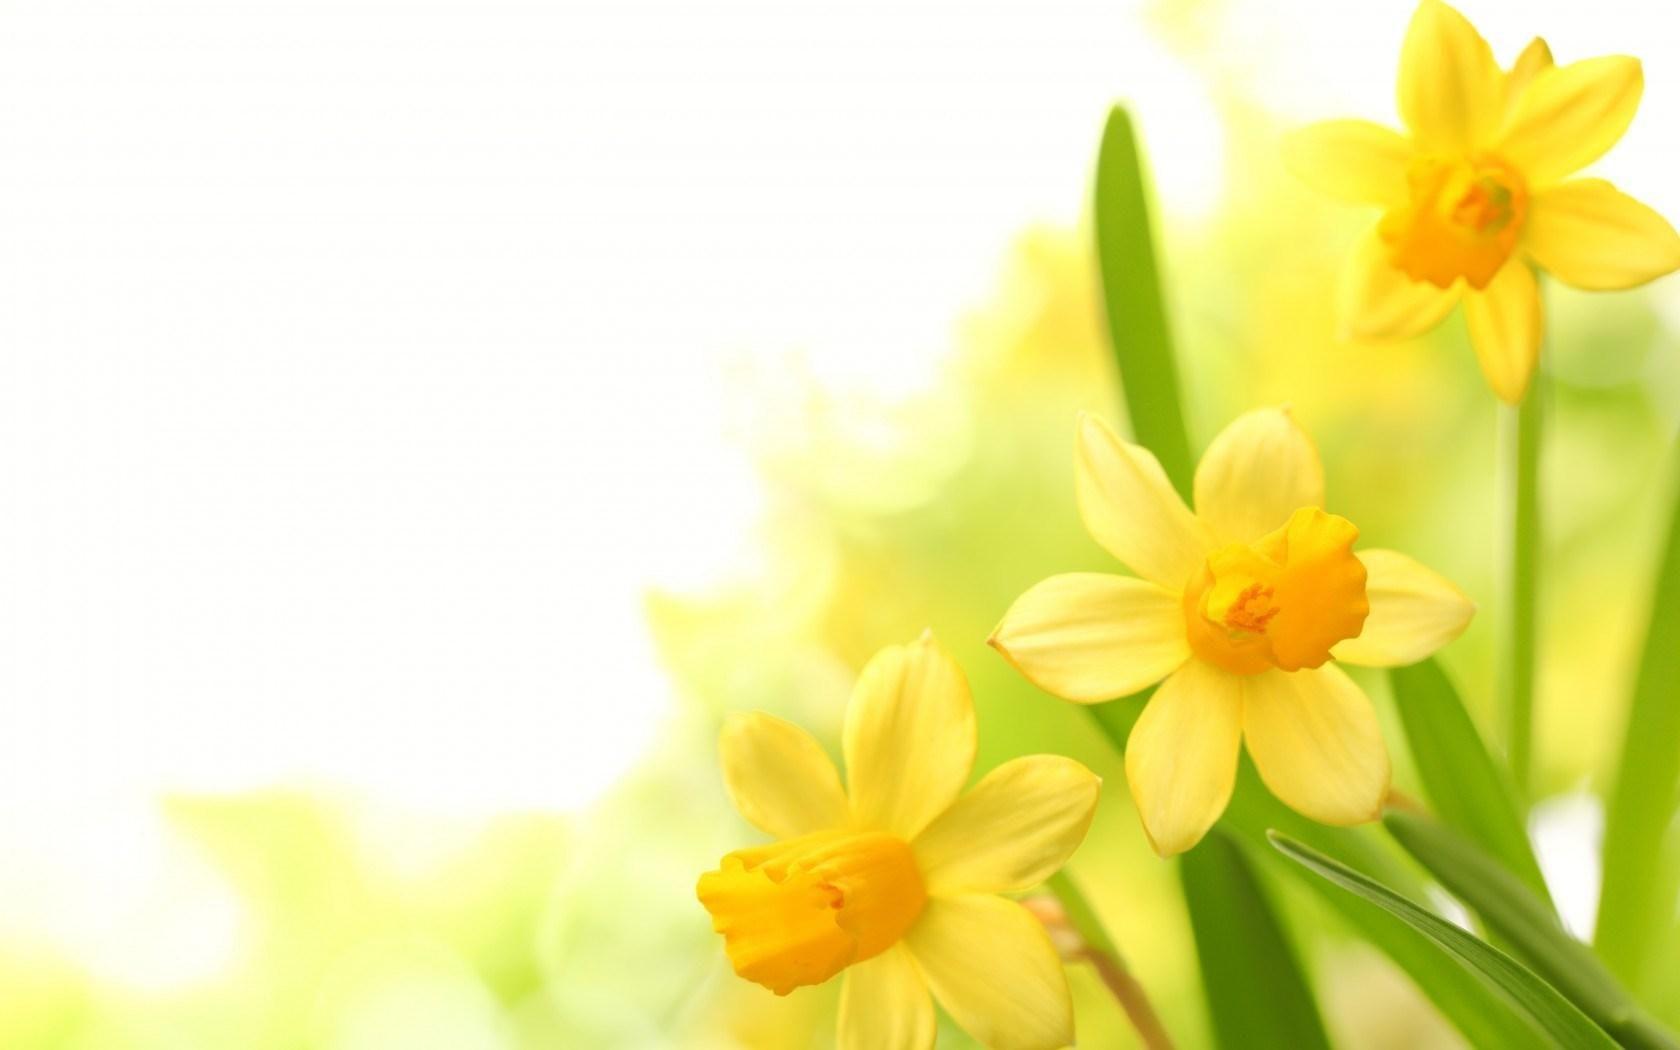 Hd wallpaper yellow flowers - Yellow Flowers Wallpapers Hd Pictures One Hd Wallpaper Pictures